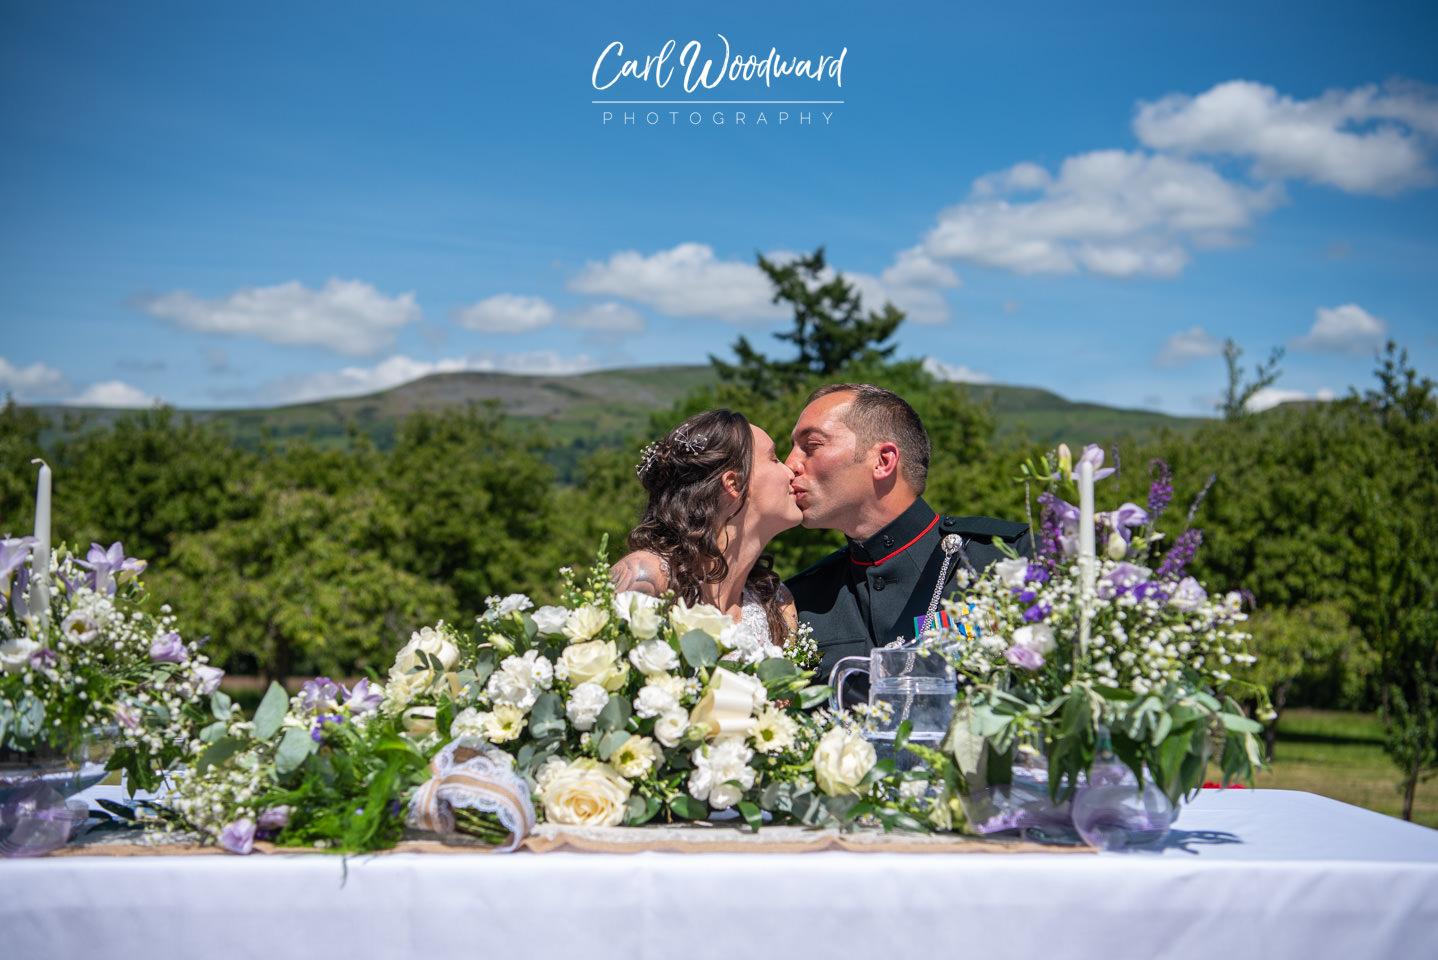 007-The-Old-Rectory-Hotel-Wedding-Photography-Cardiff-Wedding-Photographer.jpg